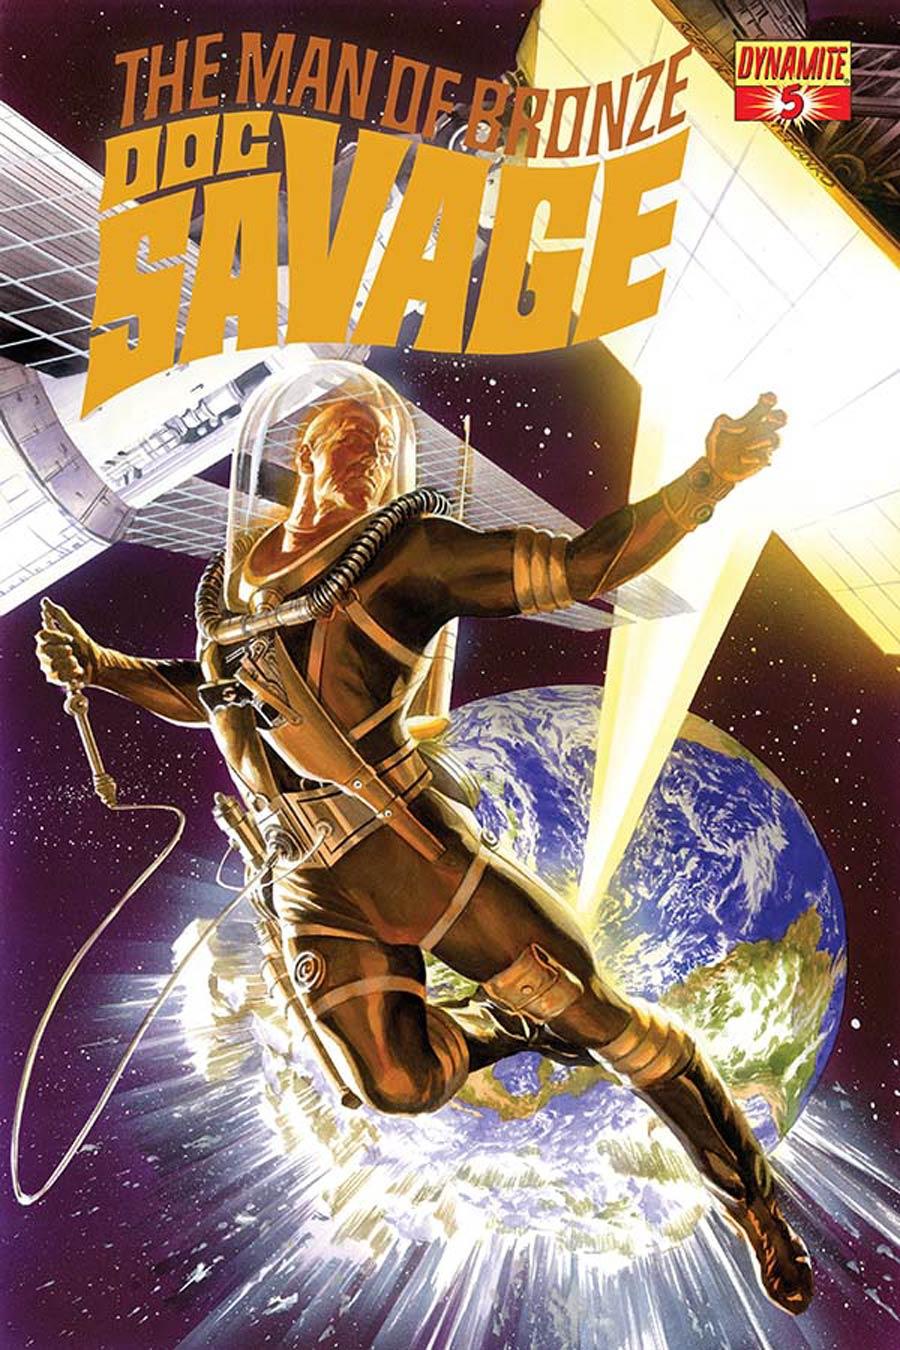 Doc Savage Vol 5 #5 Cover A Regular Alex Ross Cover